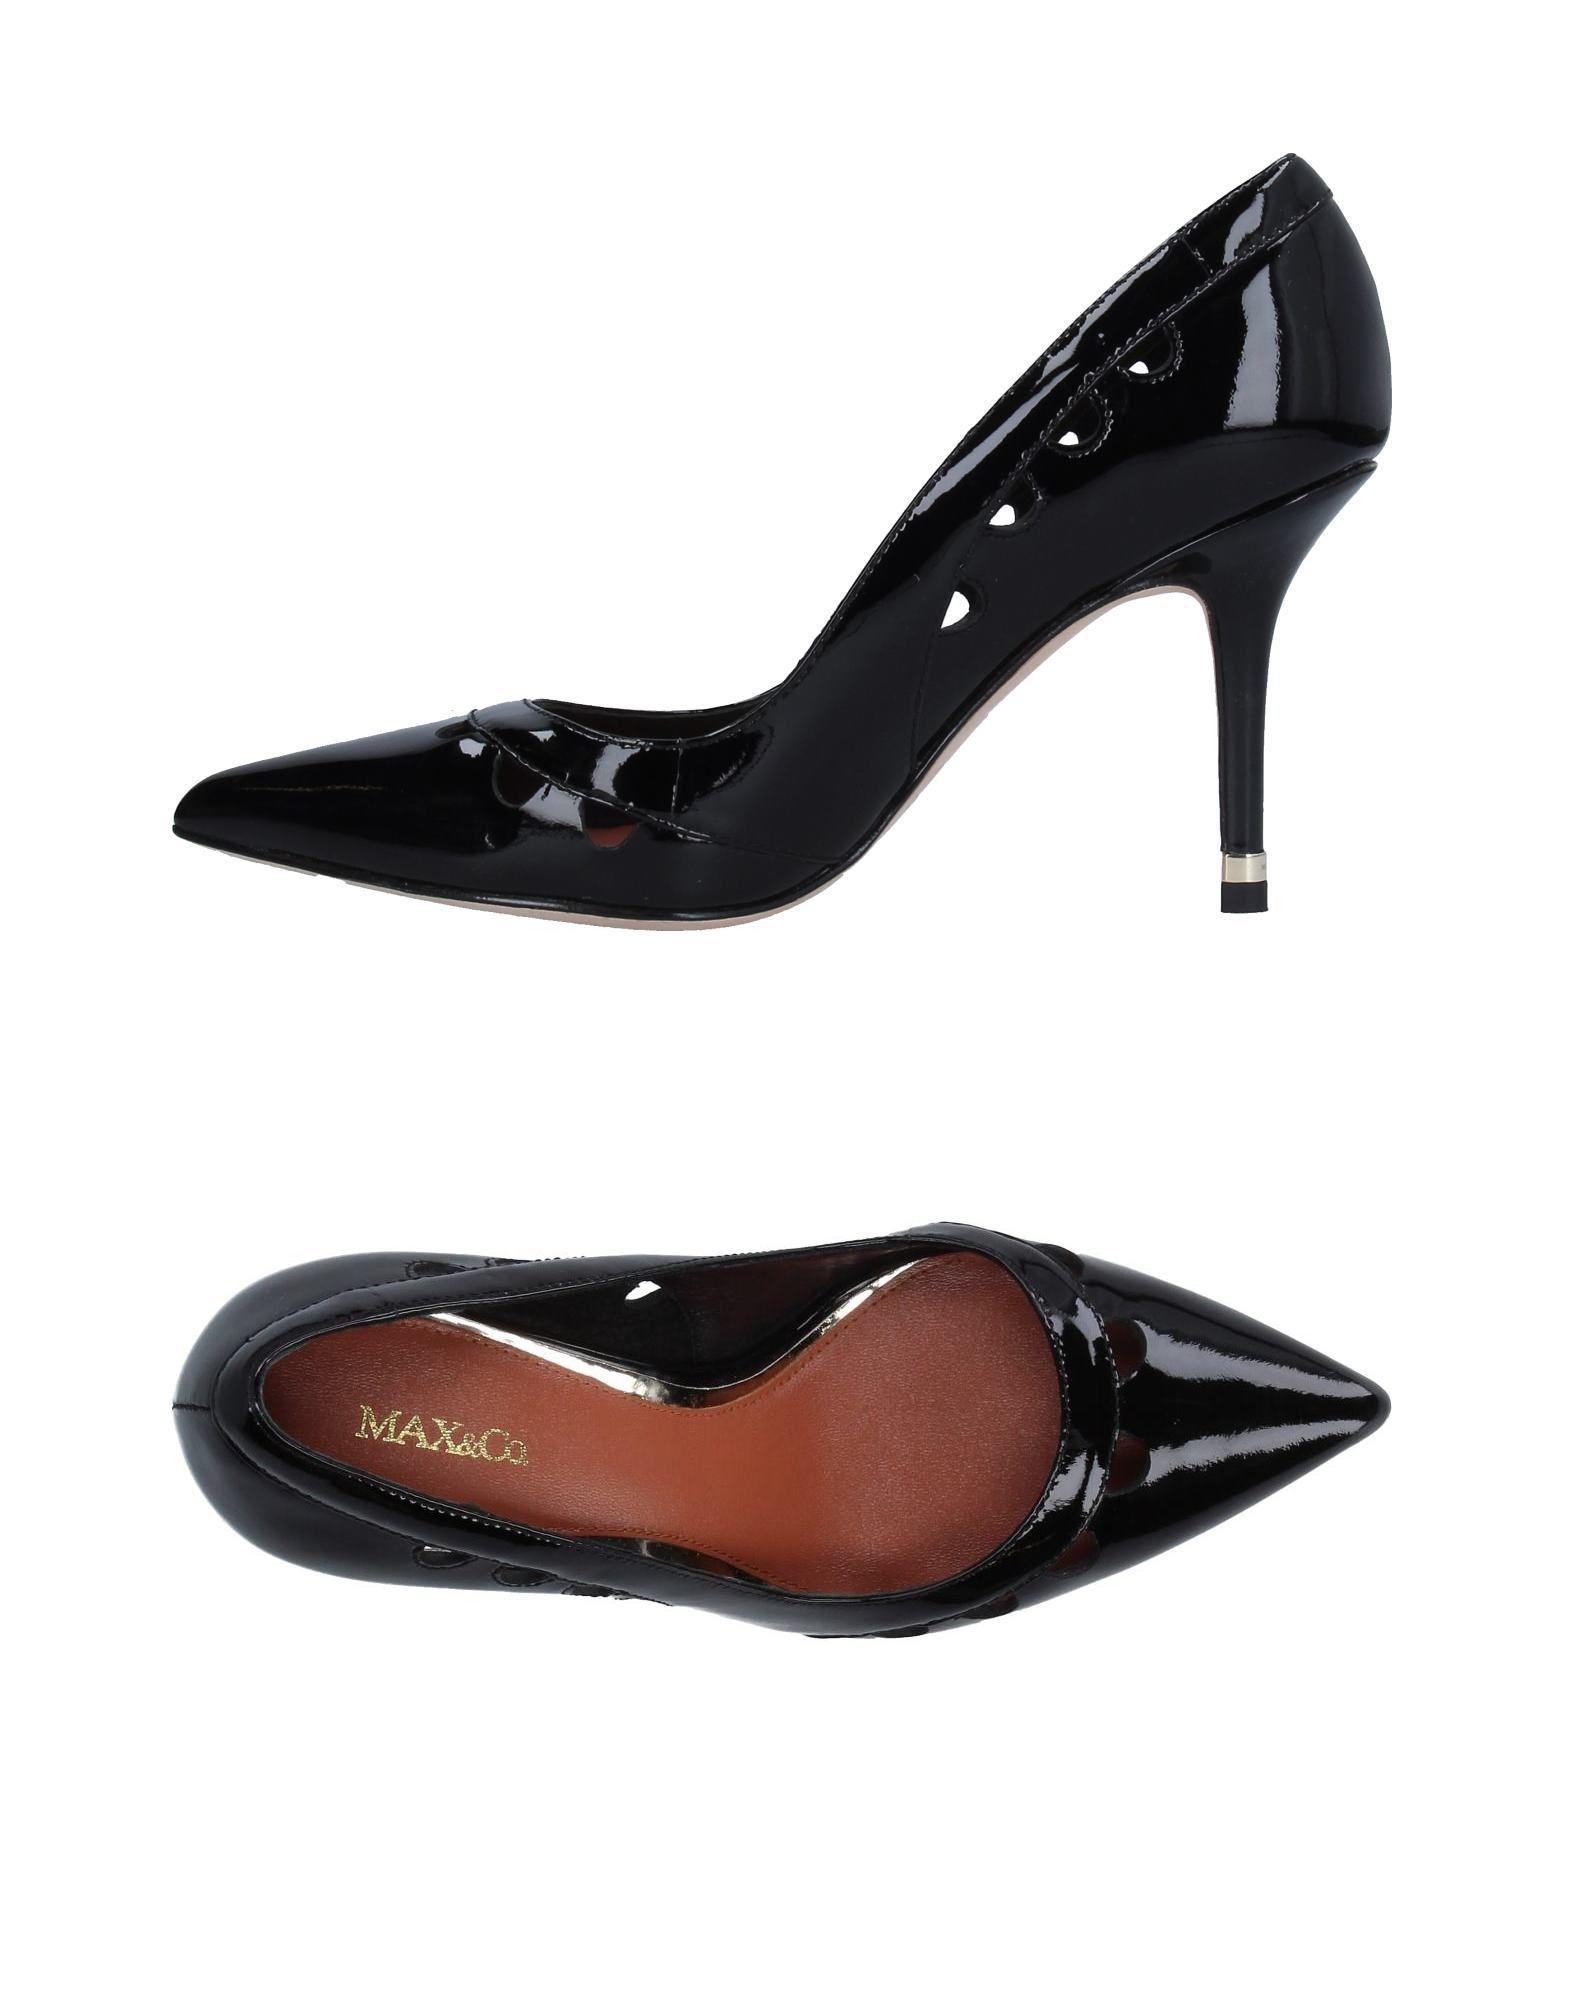 FOOTWEAR - Pumps on YOOX.COM Max & Co. puG7pT